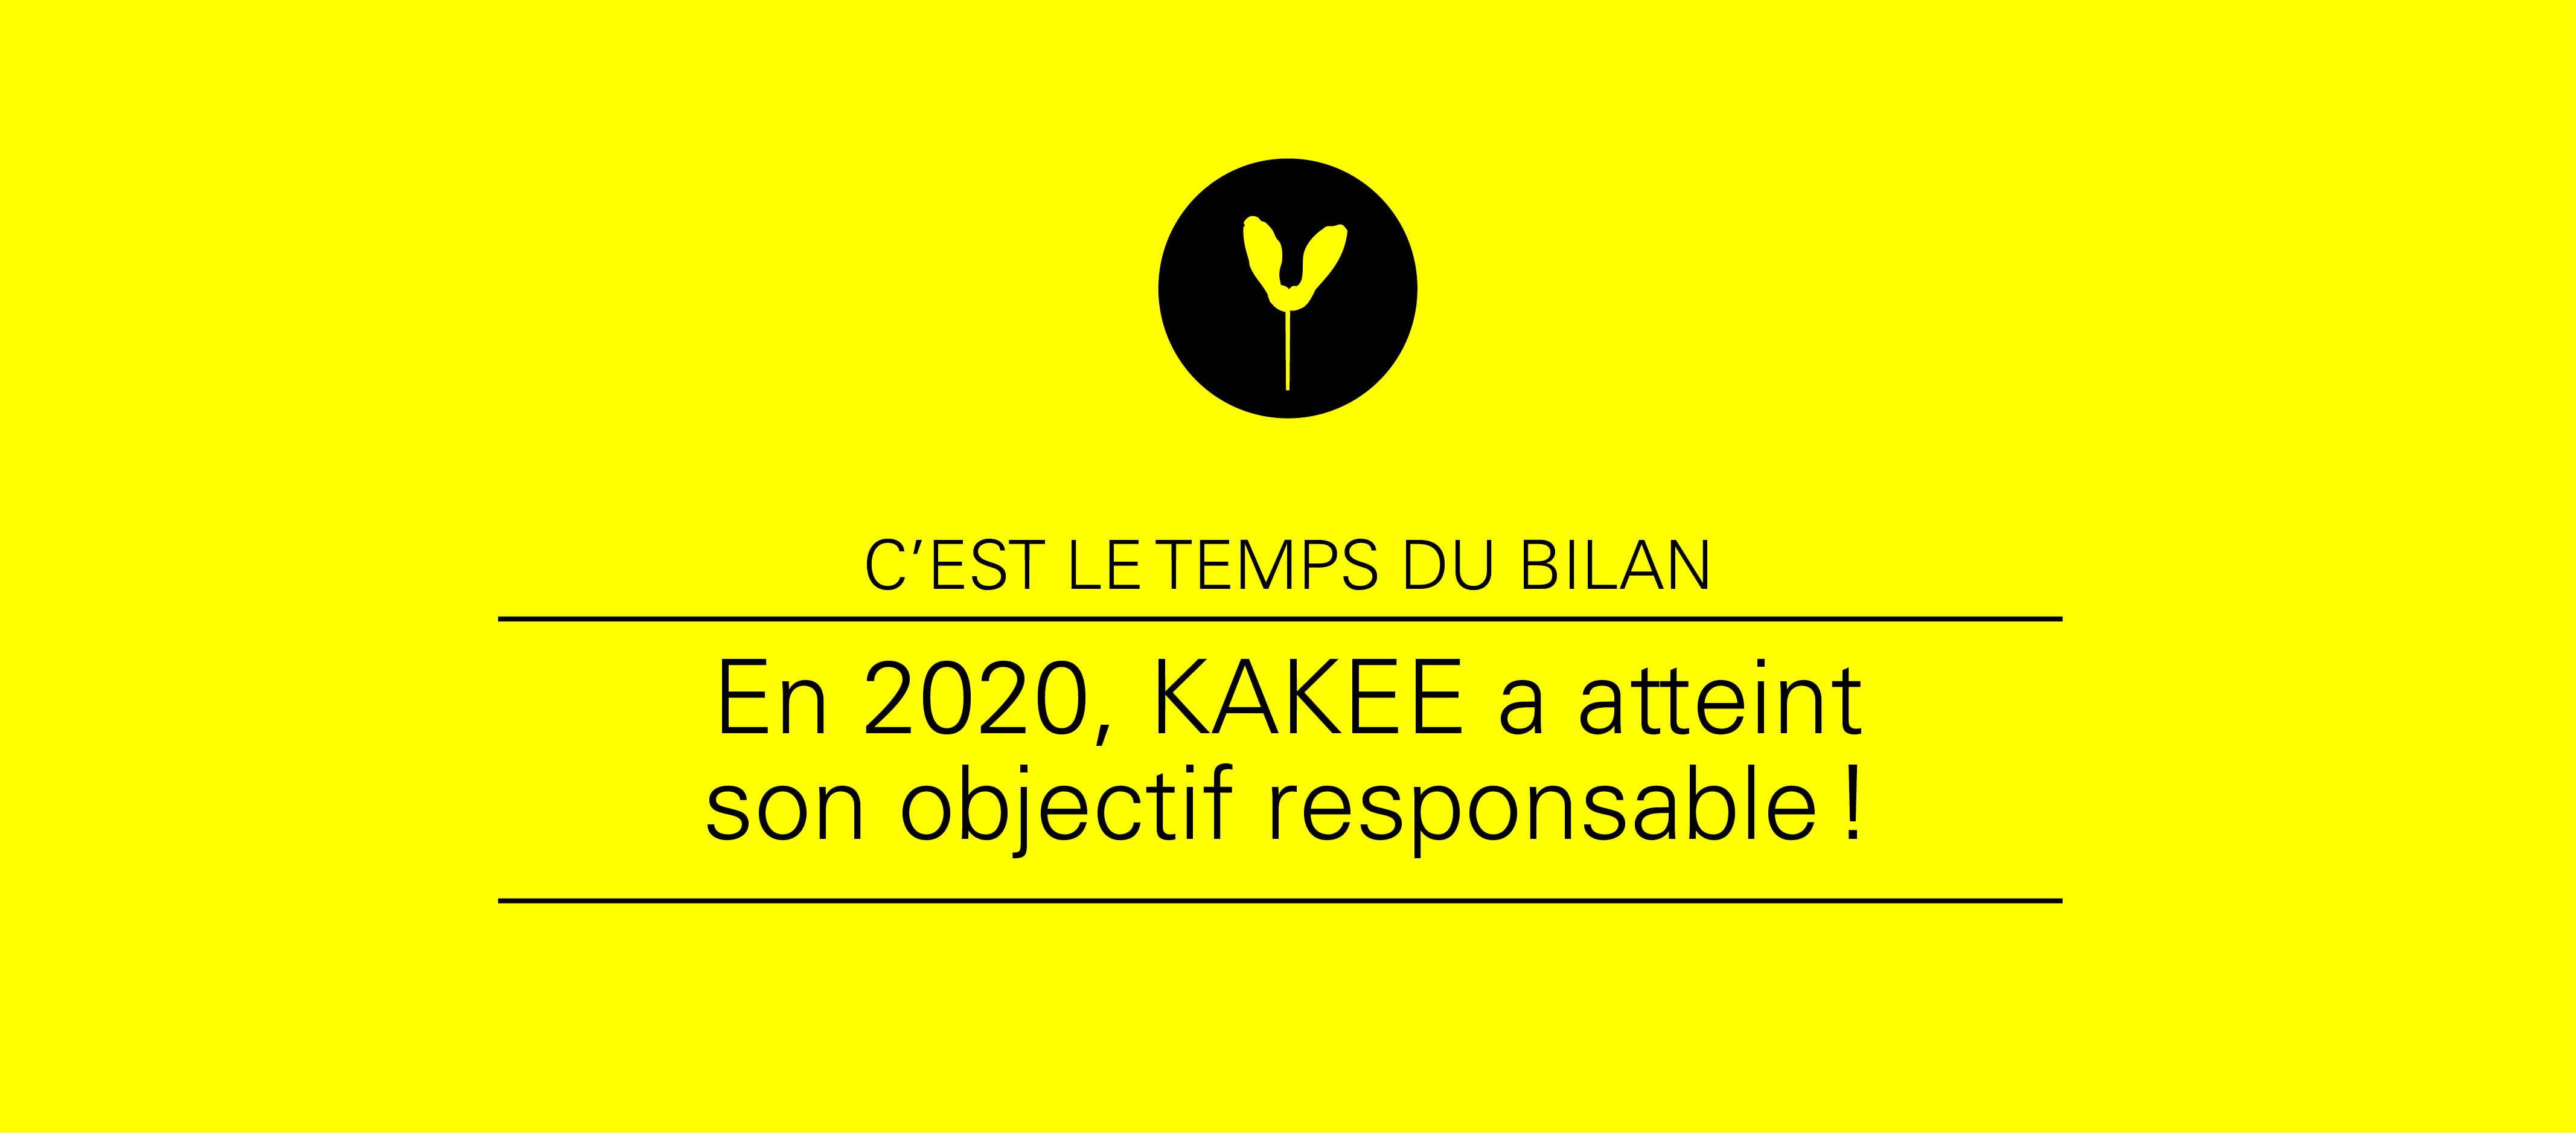 KAKEE publie son bilan responsable.